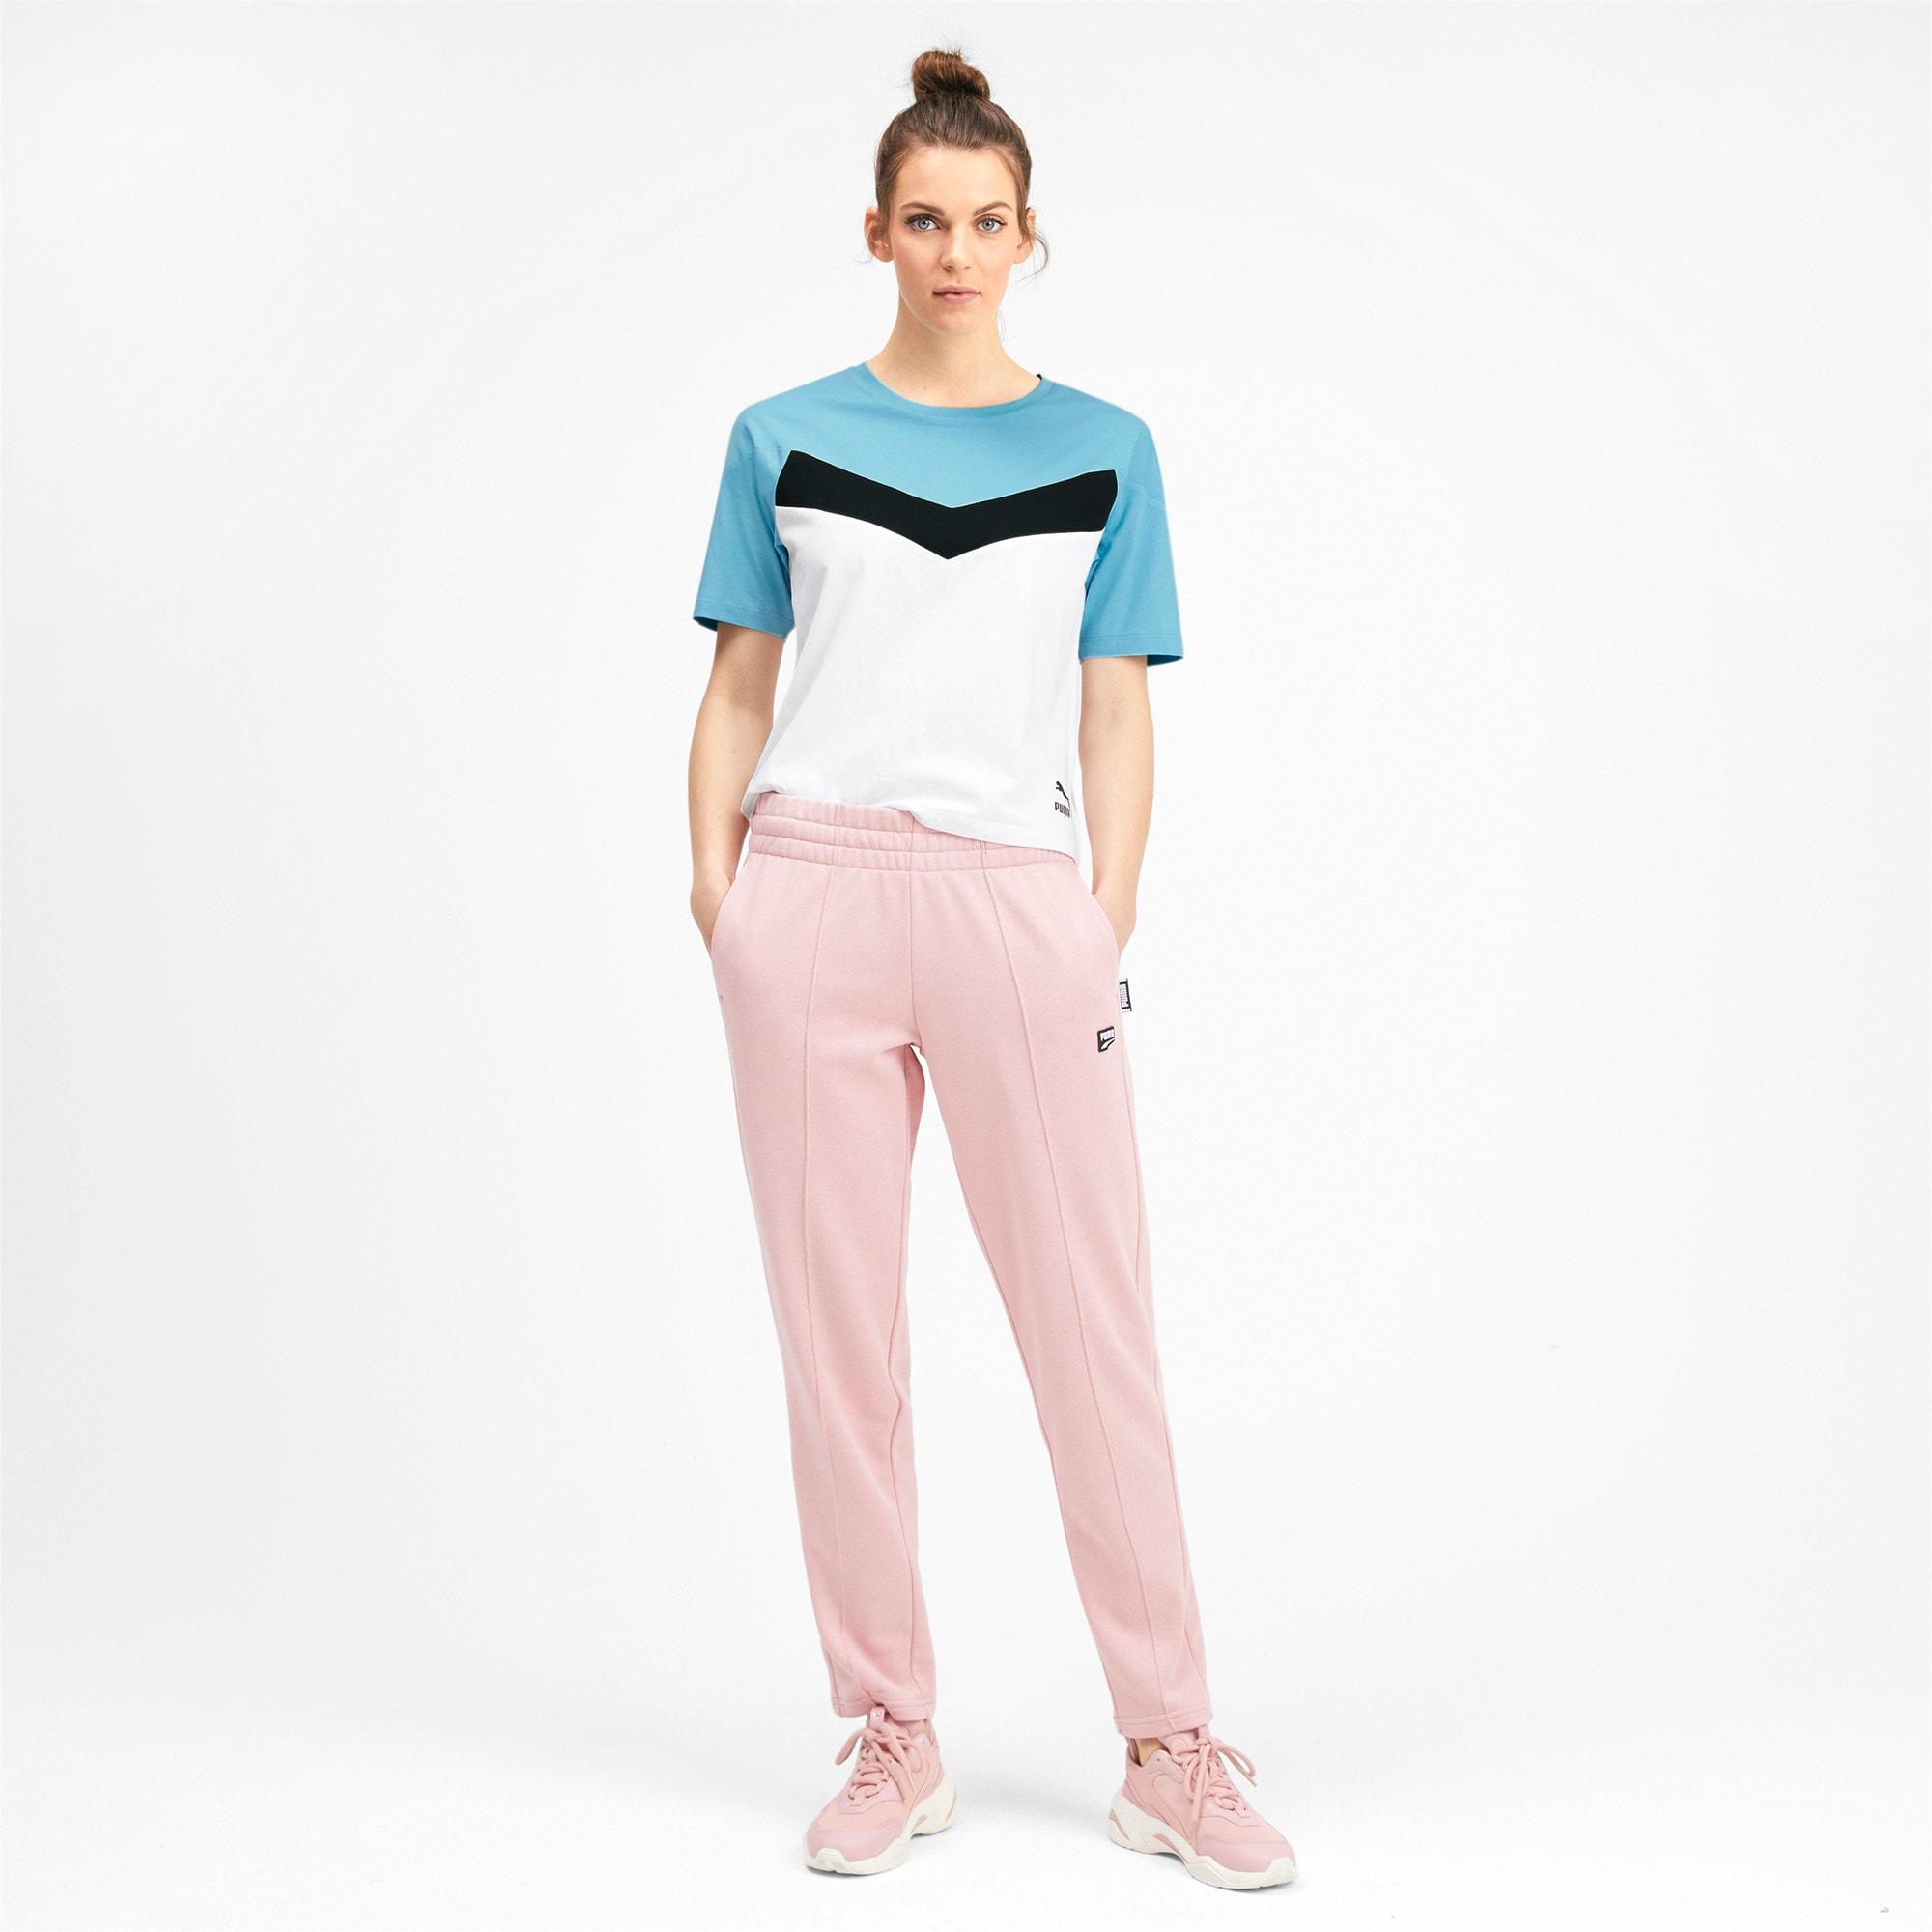 Miniatura 3 de Camiseta PUMA XTG en colores combinados para mujer, Puma White, mediano